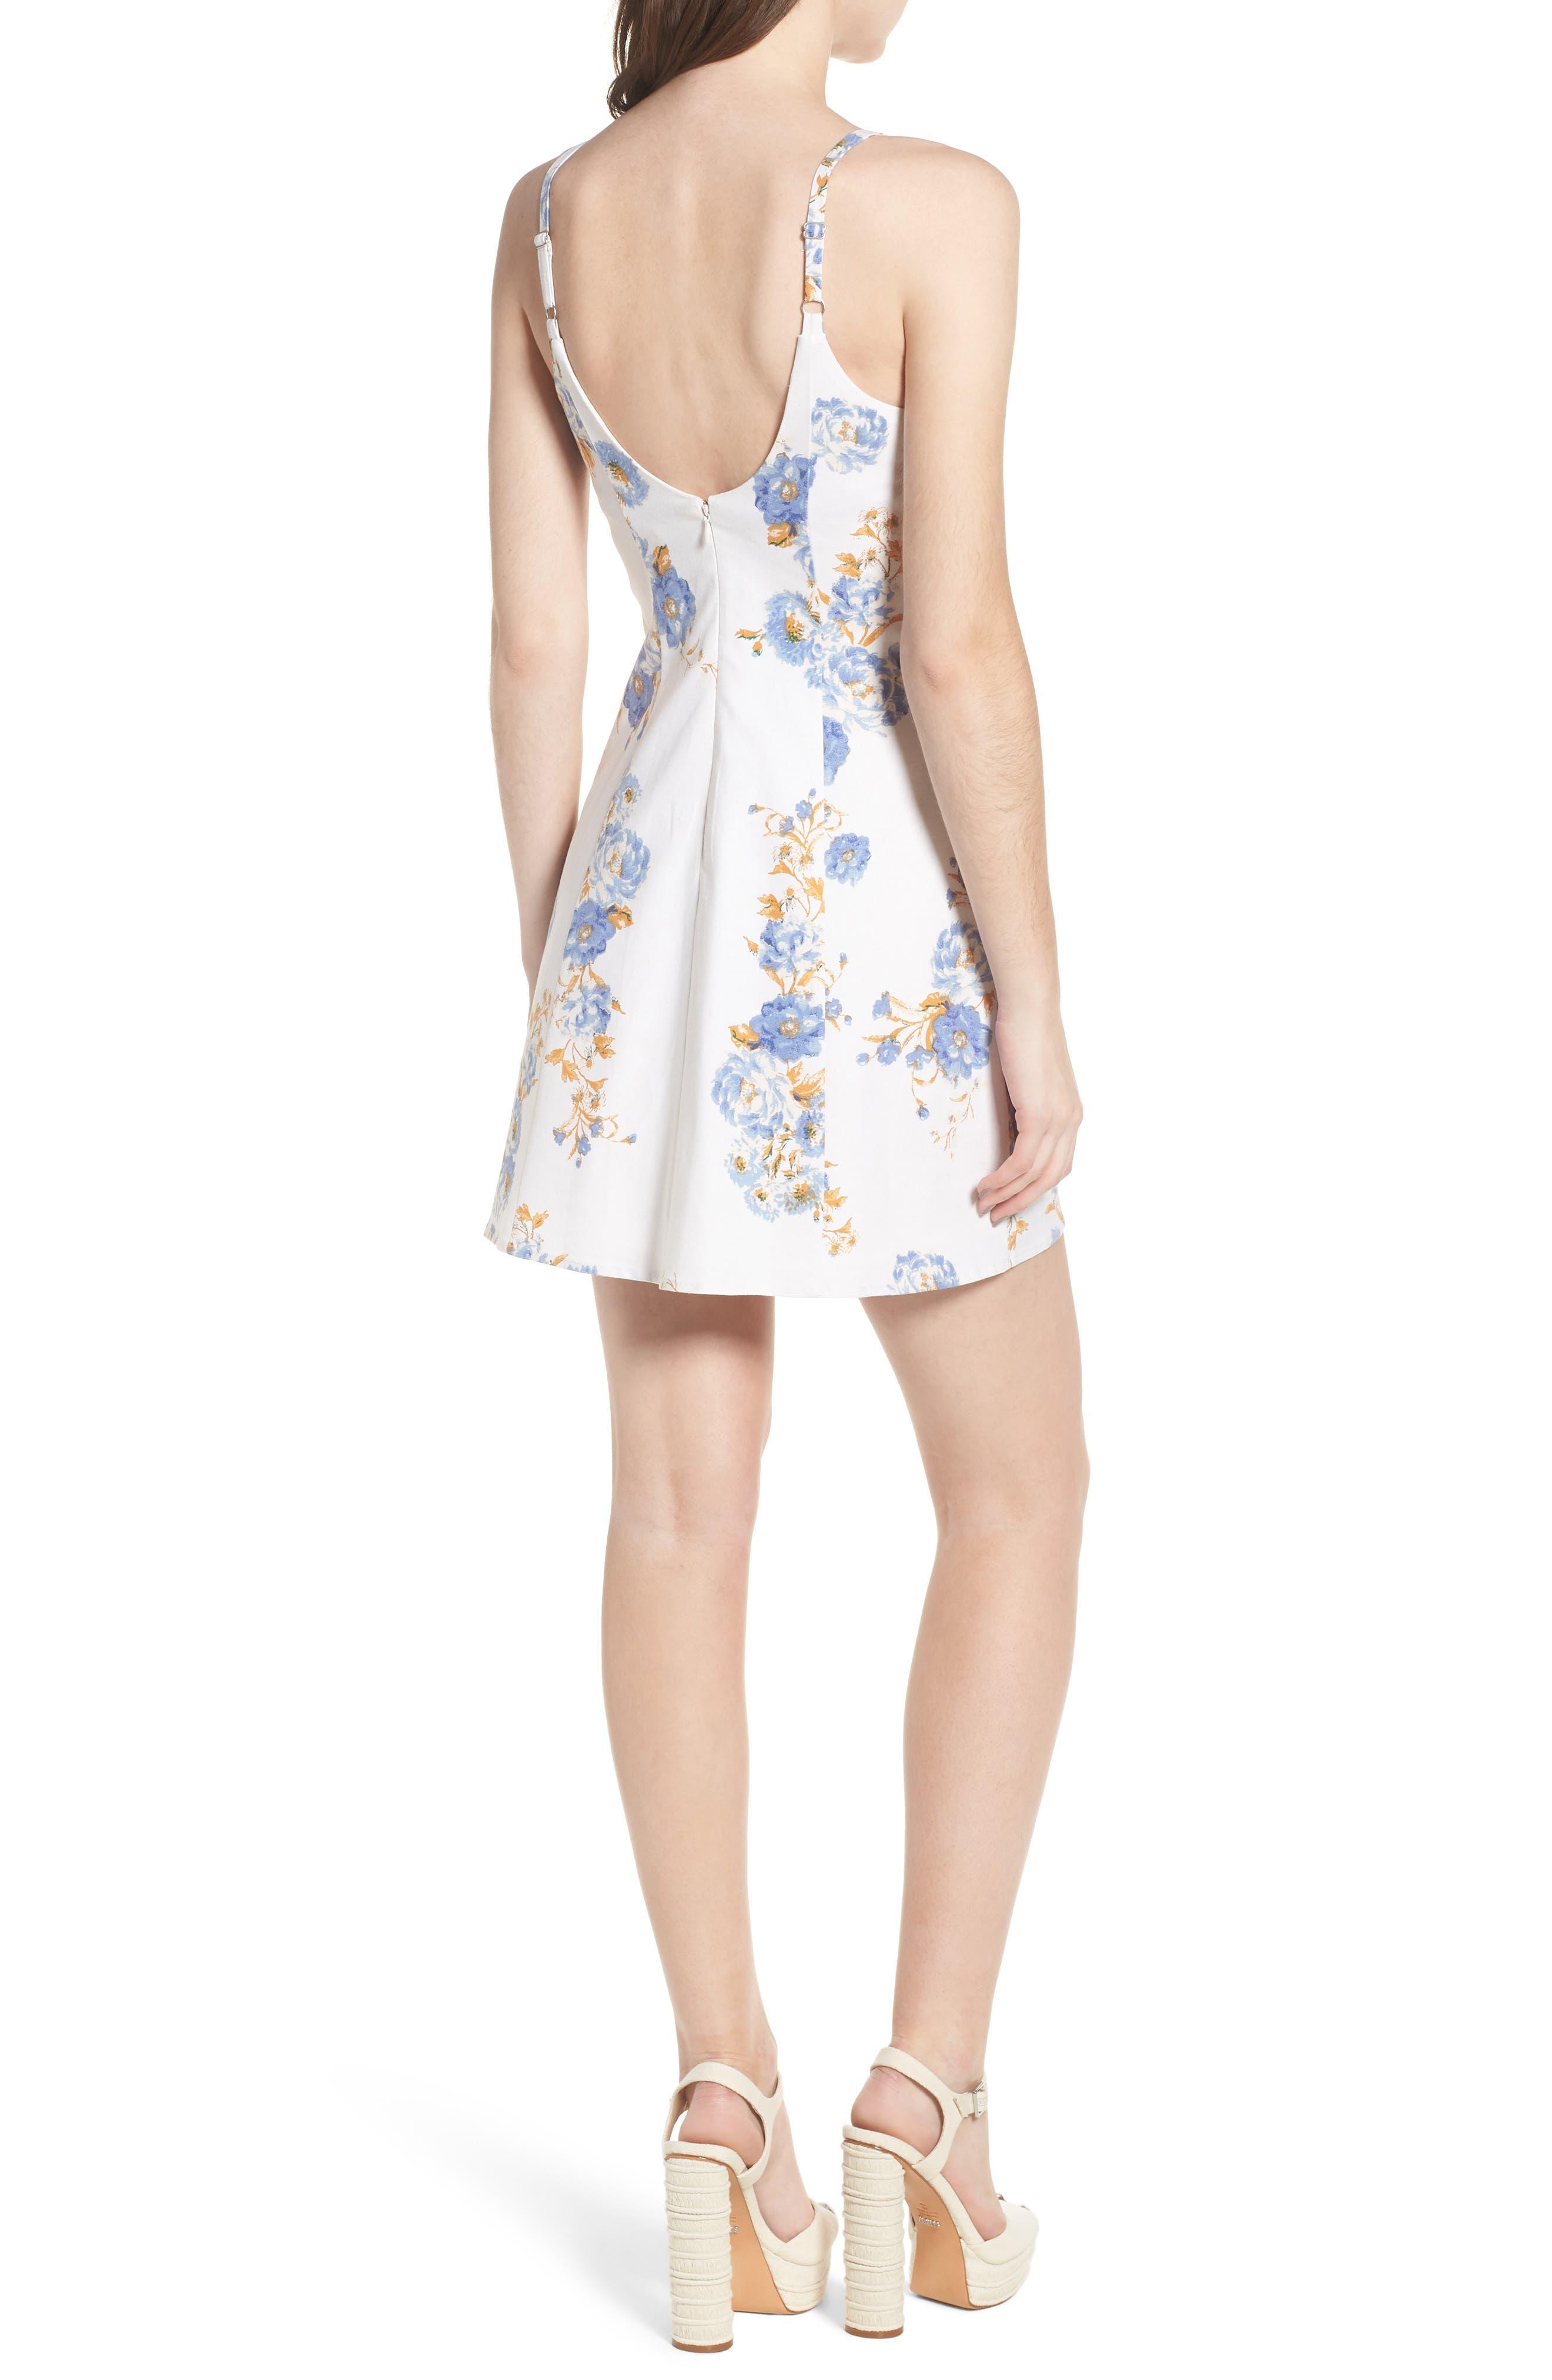 Modena Lace-Up Minidress,                             Alternate thumbnail 2, color,                             Ivory Floral